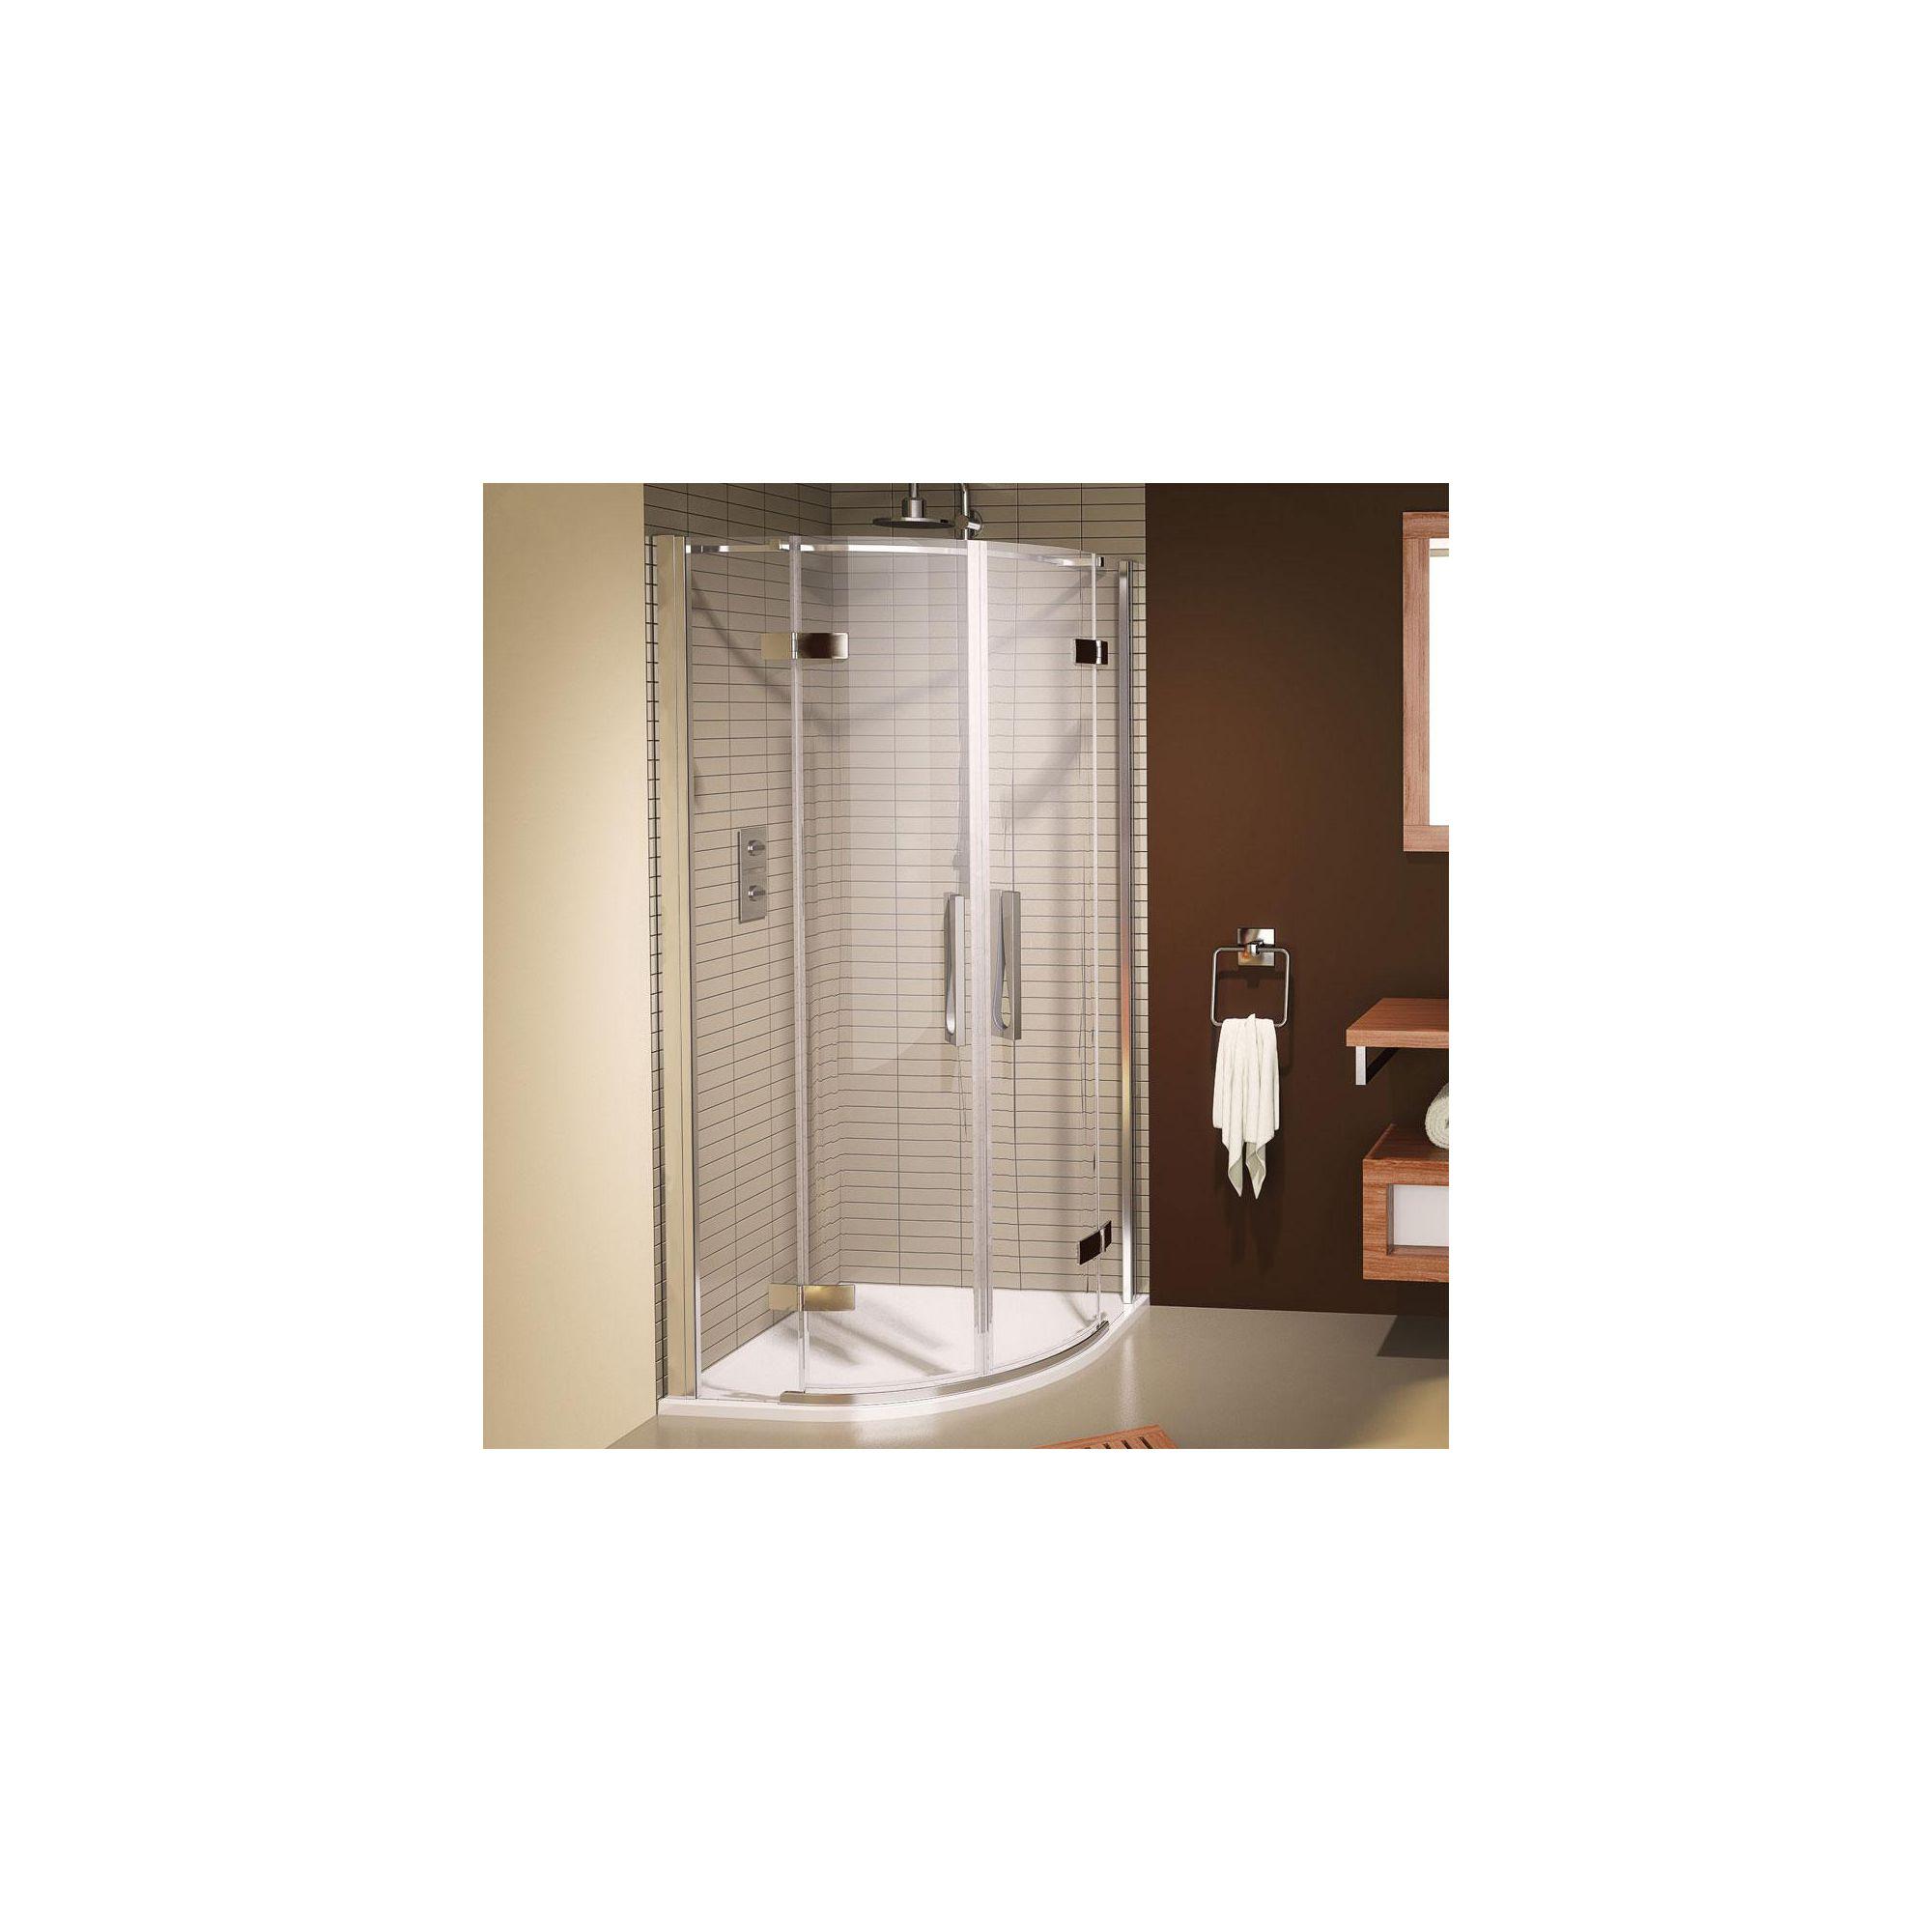 Aqualux AQUA8 Hinge Quadrant Shower Door, 900mm x 900mm, Polished Silver Frame, 8mm Glass at Tescos Direct